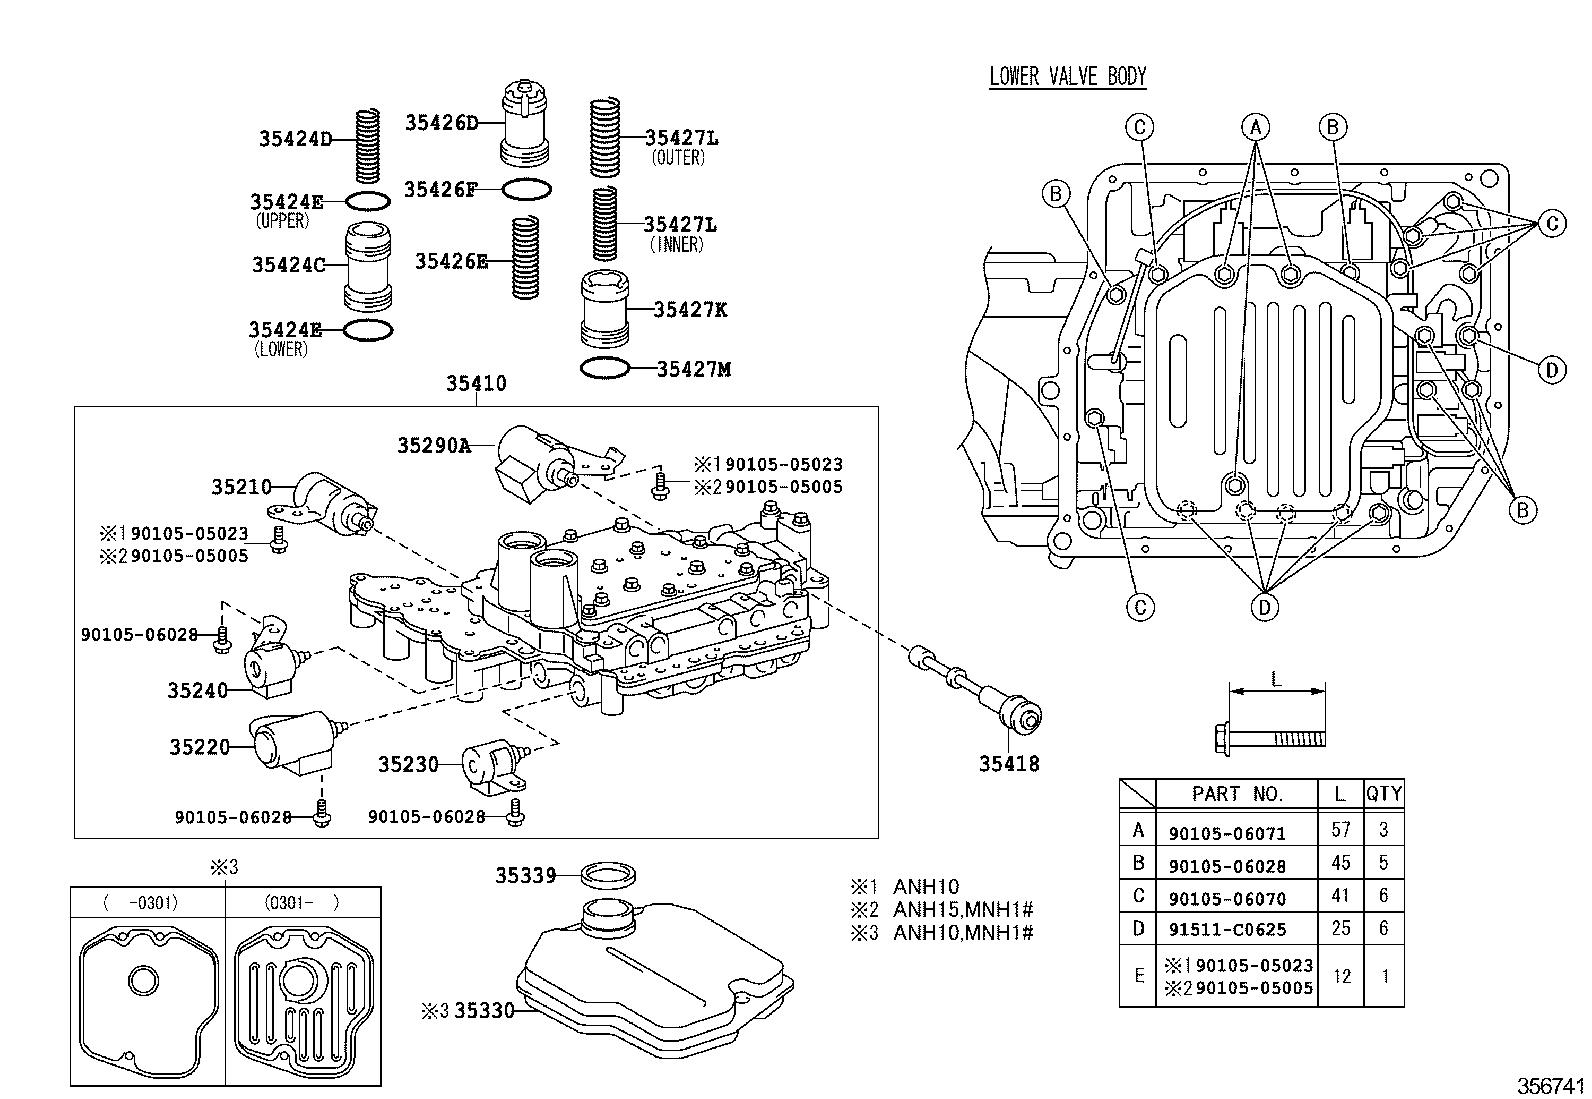 Wiring Diagram Toyota Alphard: Razor go cart wiring